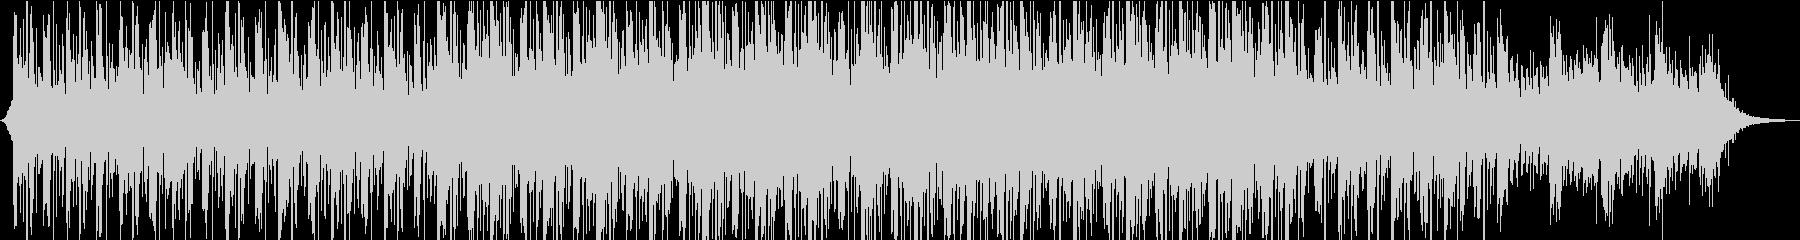 Background Soundscapの未再生の波形